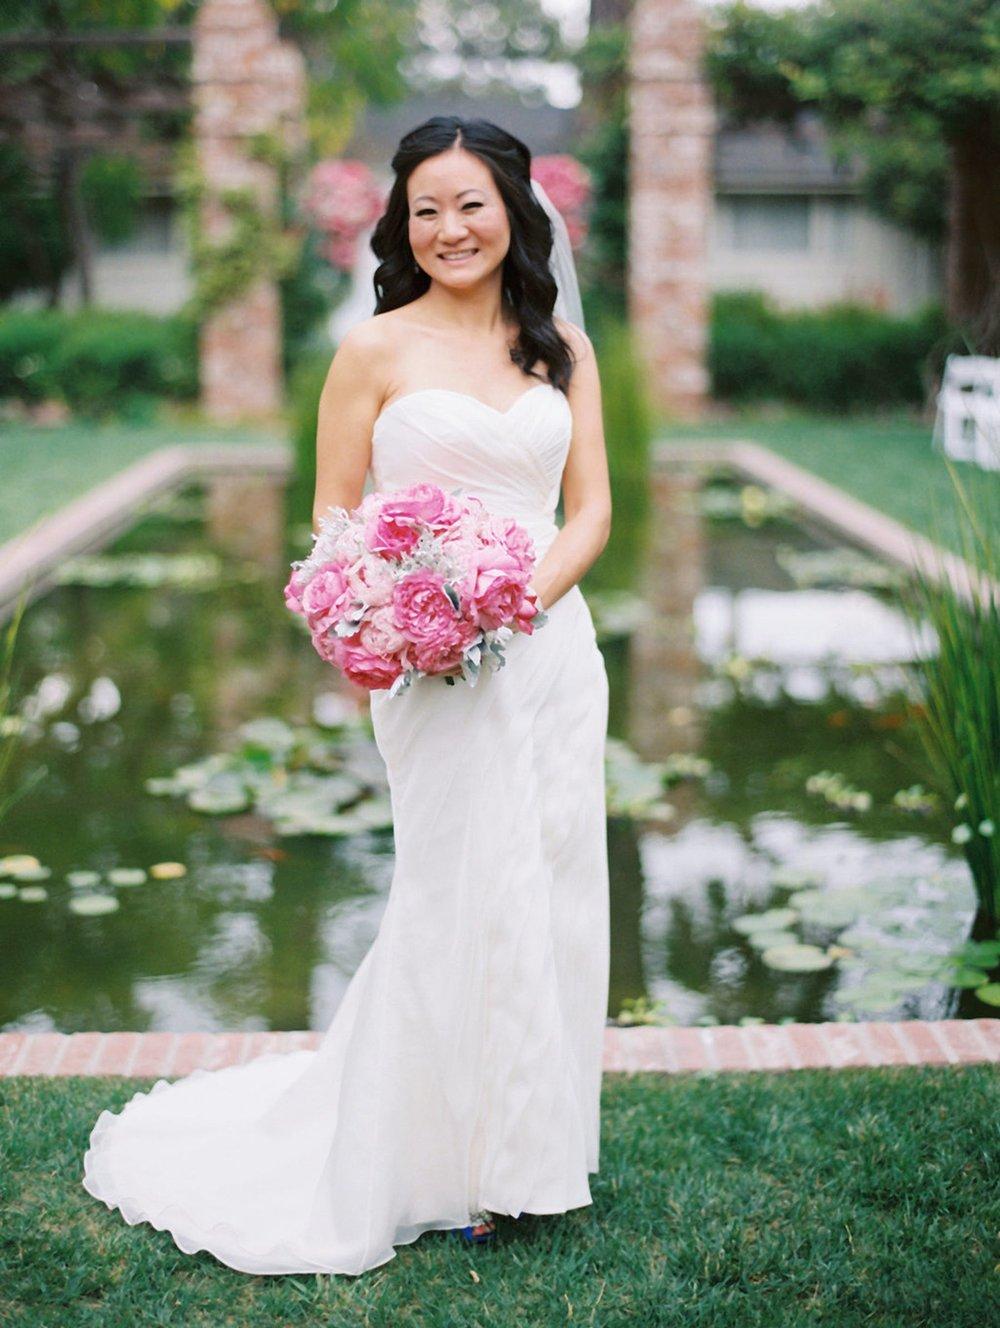 www.santabarbarawedding.com | El Encanto | Coco Rose Design | This Modern Romance | Bride